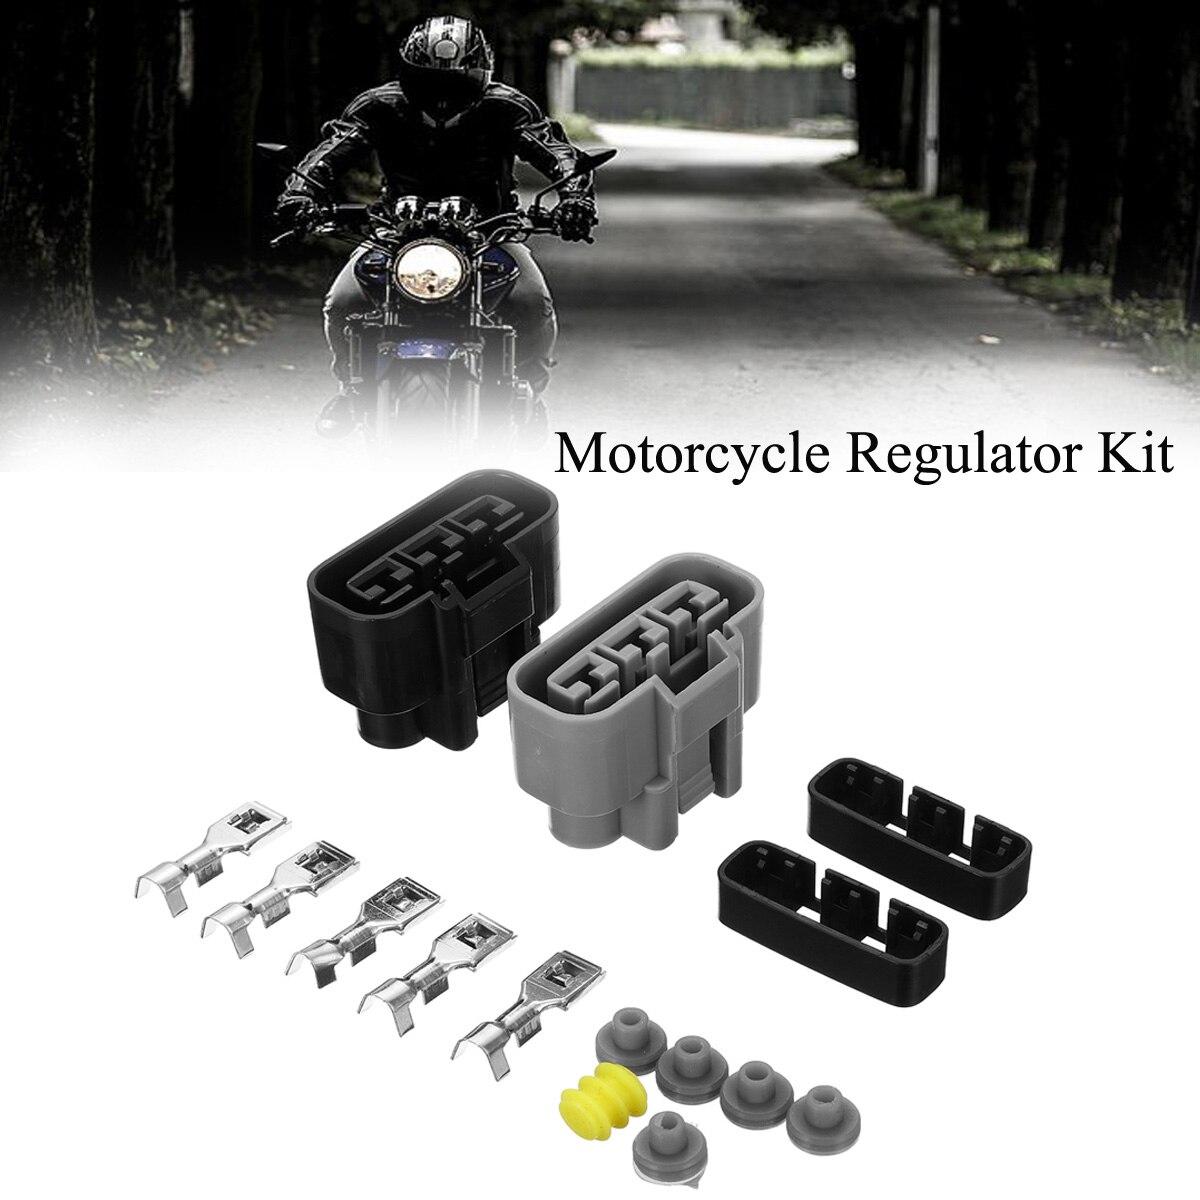 Regulador de voltagem, kit de conector elétrico 710000261 para kan-am honda kawasaki yamaha bmw po1 acessórios para motocicleta